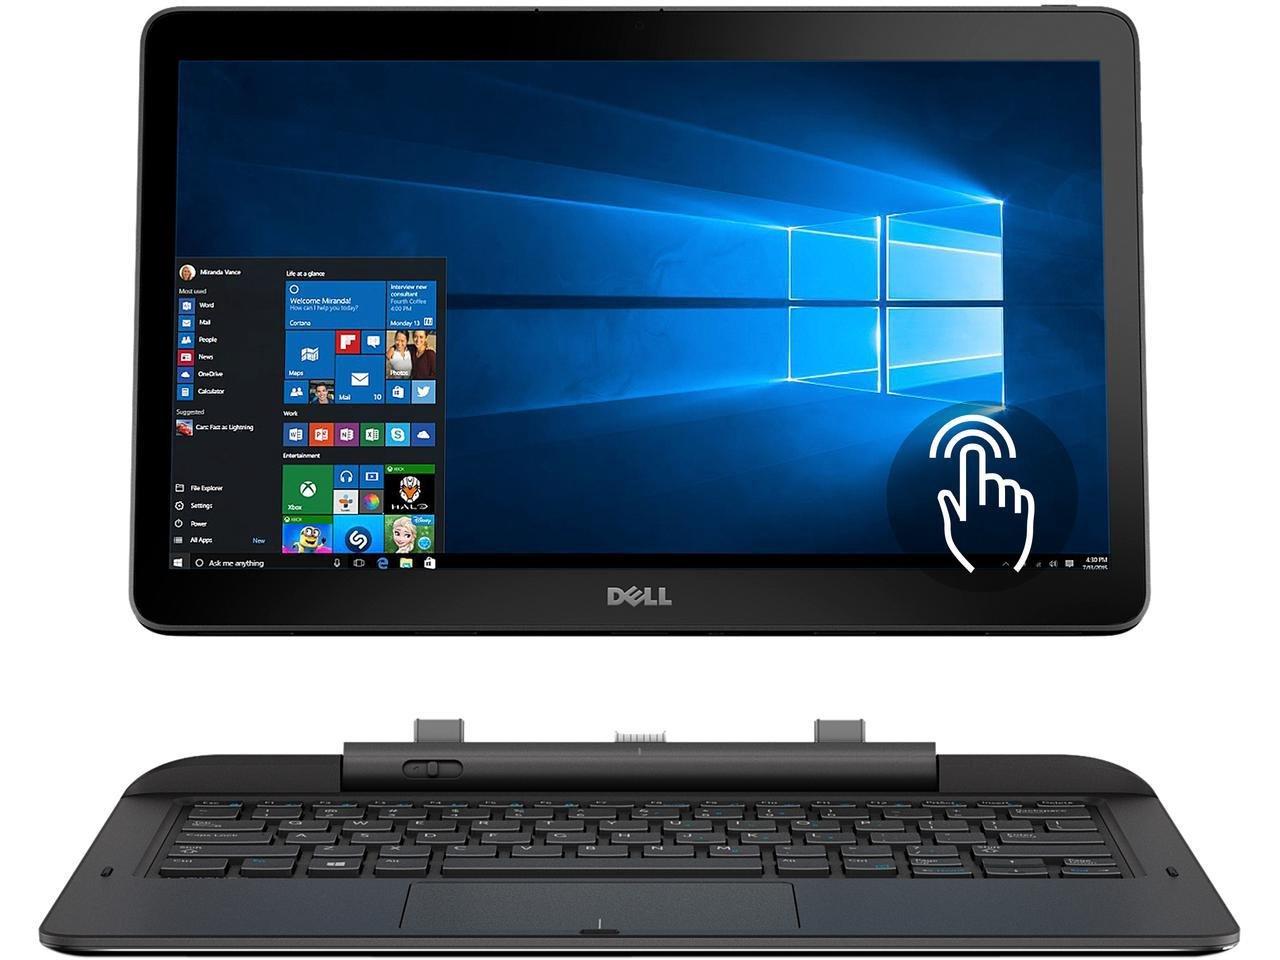 2 in 1 Dell Latitude 7000 13.3'' FHD Touchscreen Flagship High Performance Business Laptop PC, Intel core M, 4GB RAM, 128GB SSD, WIFI, Bluetooth, Backlit Keyboard, Windows 10 Pro (Black)